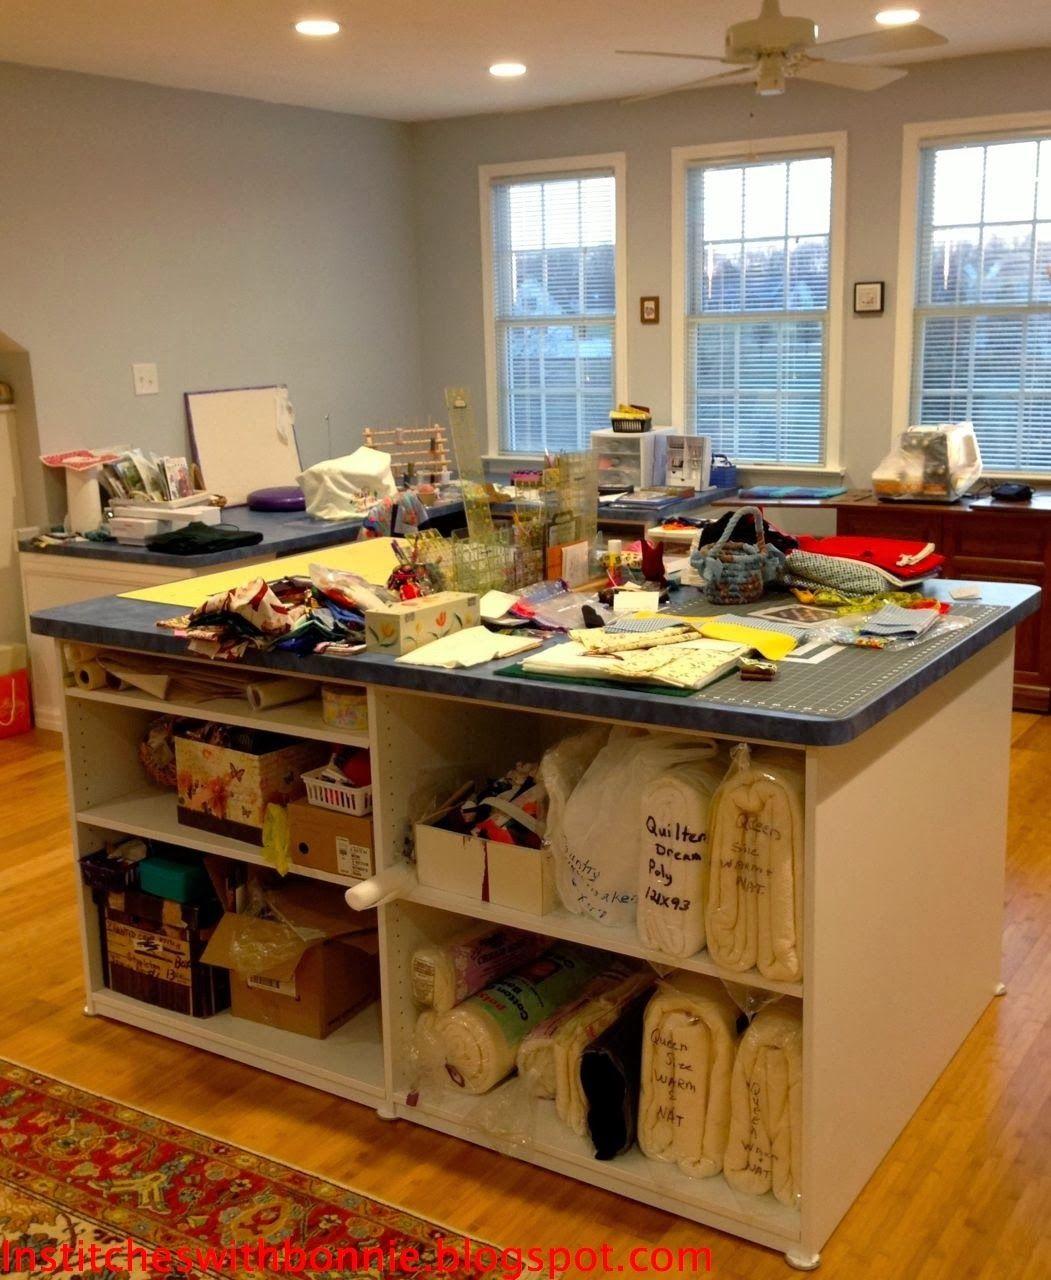 Diy sewing table ikea battingstoragenewg   diy sewing room  pinterest